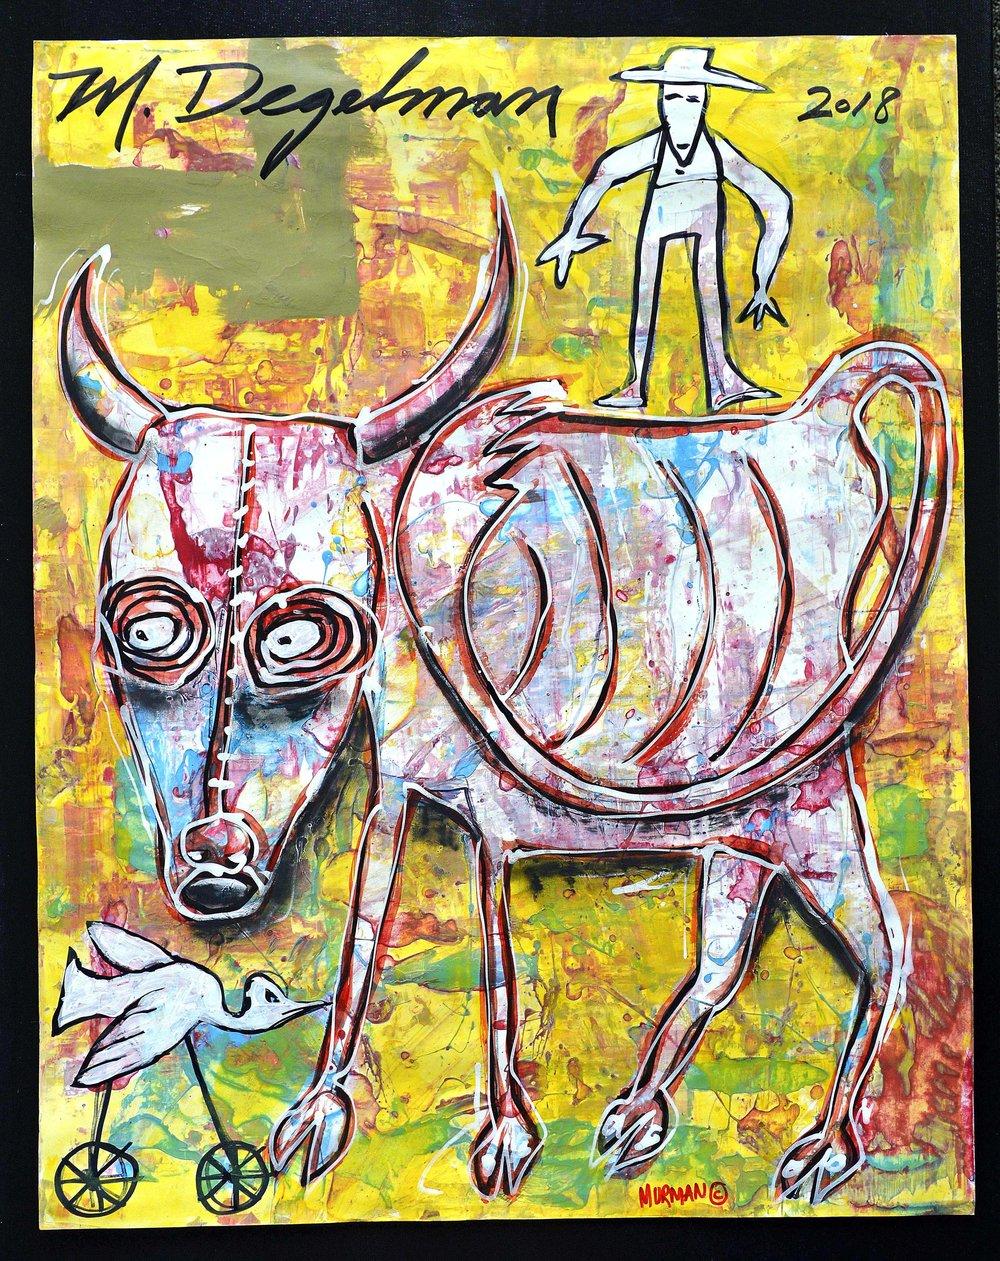 2018-Skinny-Cow-Acrylic-on-Paper-28-x-22.jpg